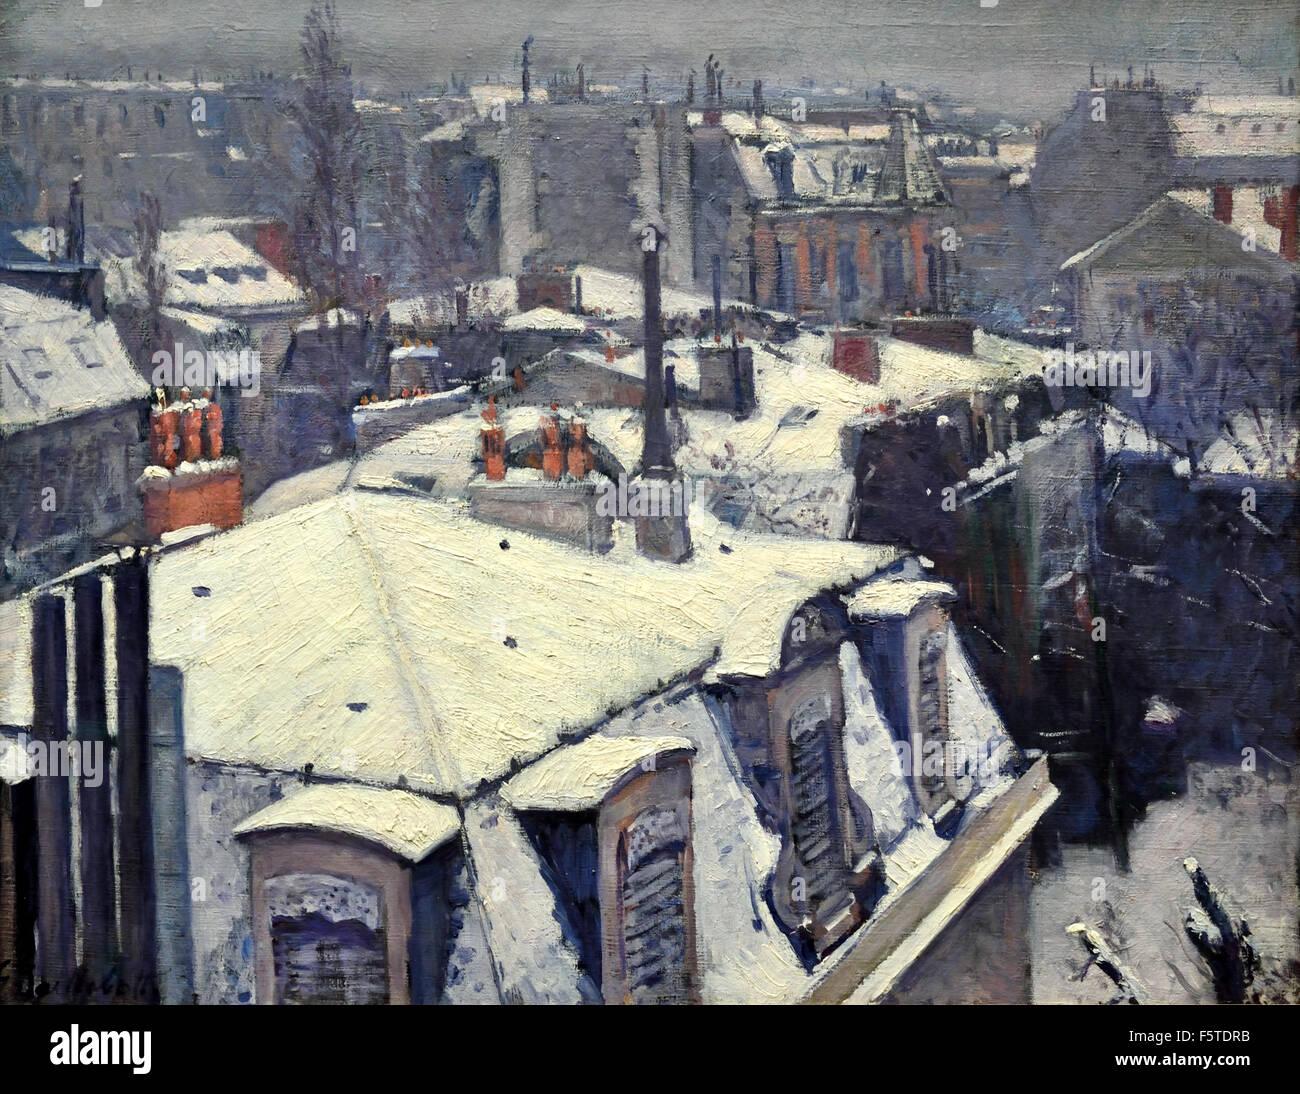 Vue de toits (Effet de neige) Rooftops (Snow Effect) 1878 Gustave Caillebotte 1848 - 1894 France French - Stock Image